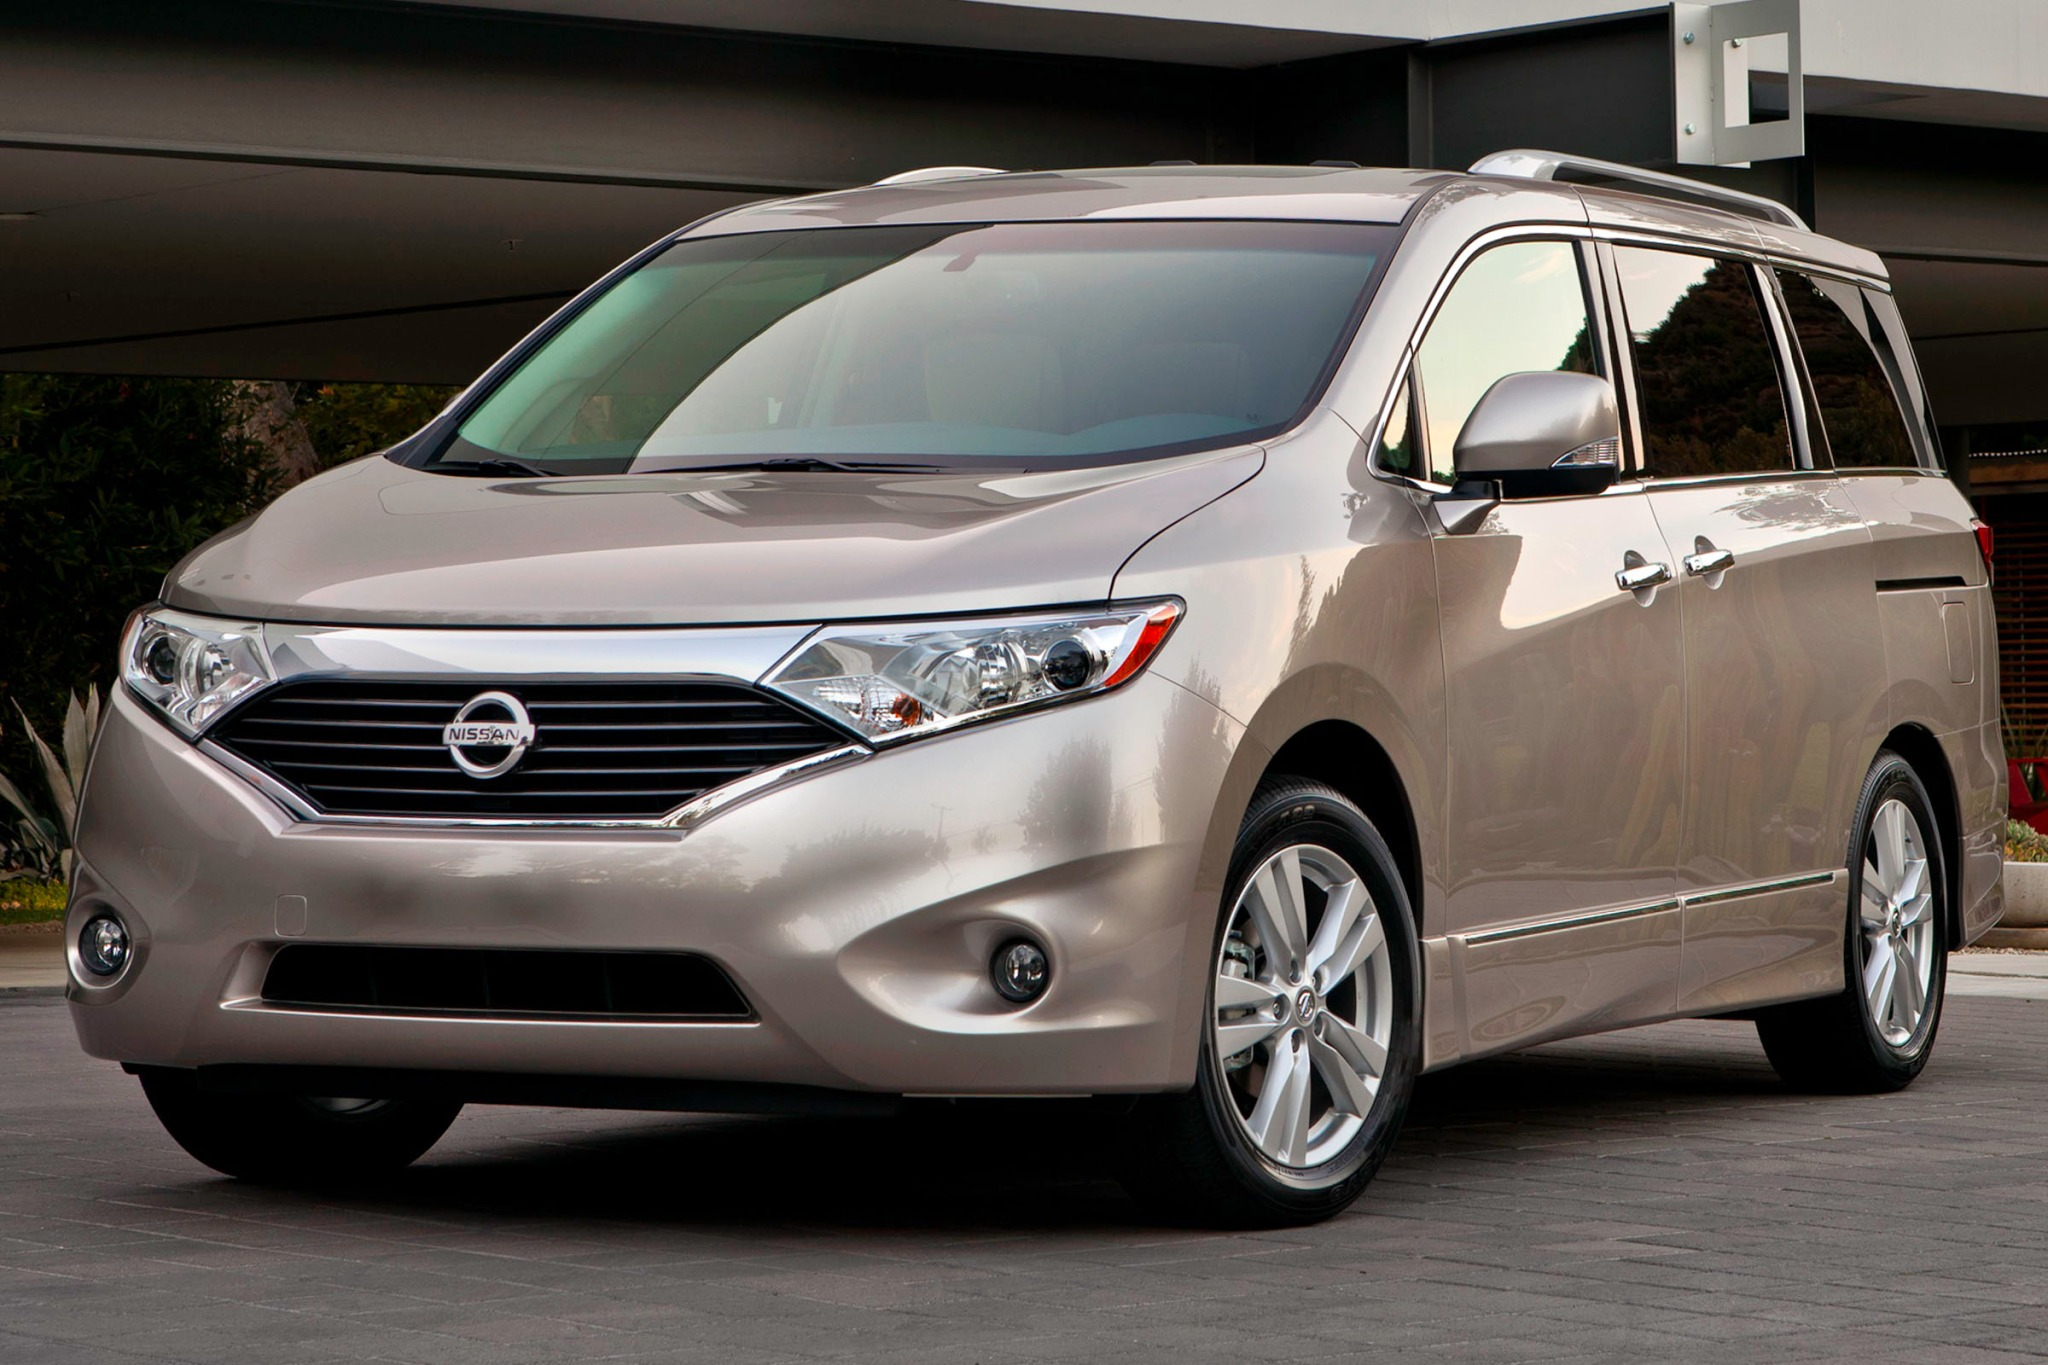 2016 nissan quest passenger minivan platinum fq oem 1 2048